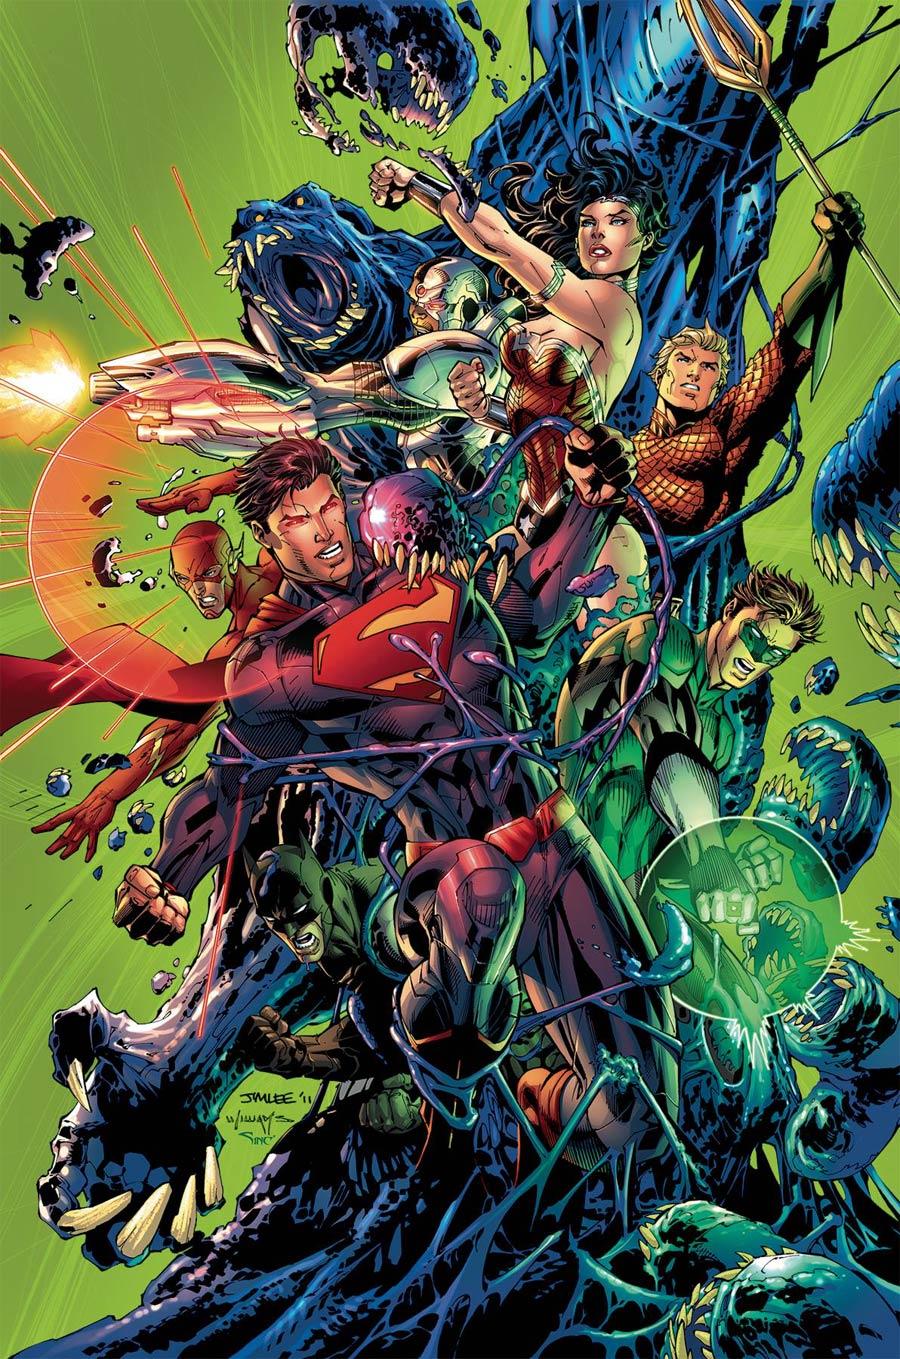 Justice League Their Greatest Triumphs TP